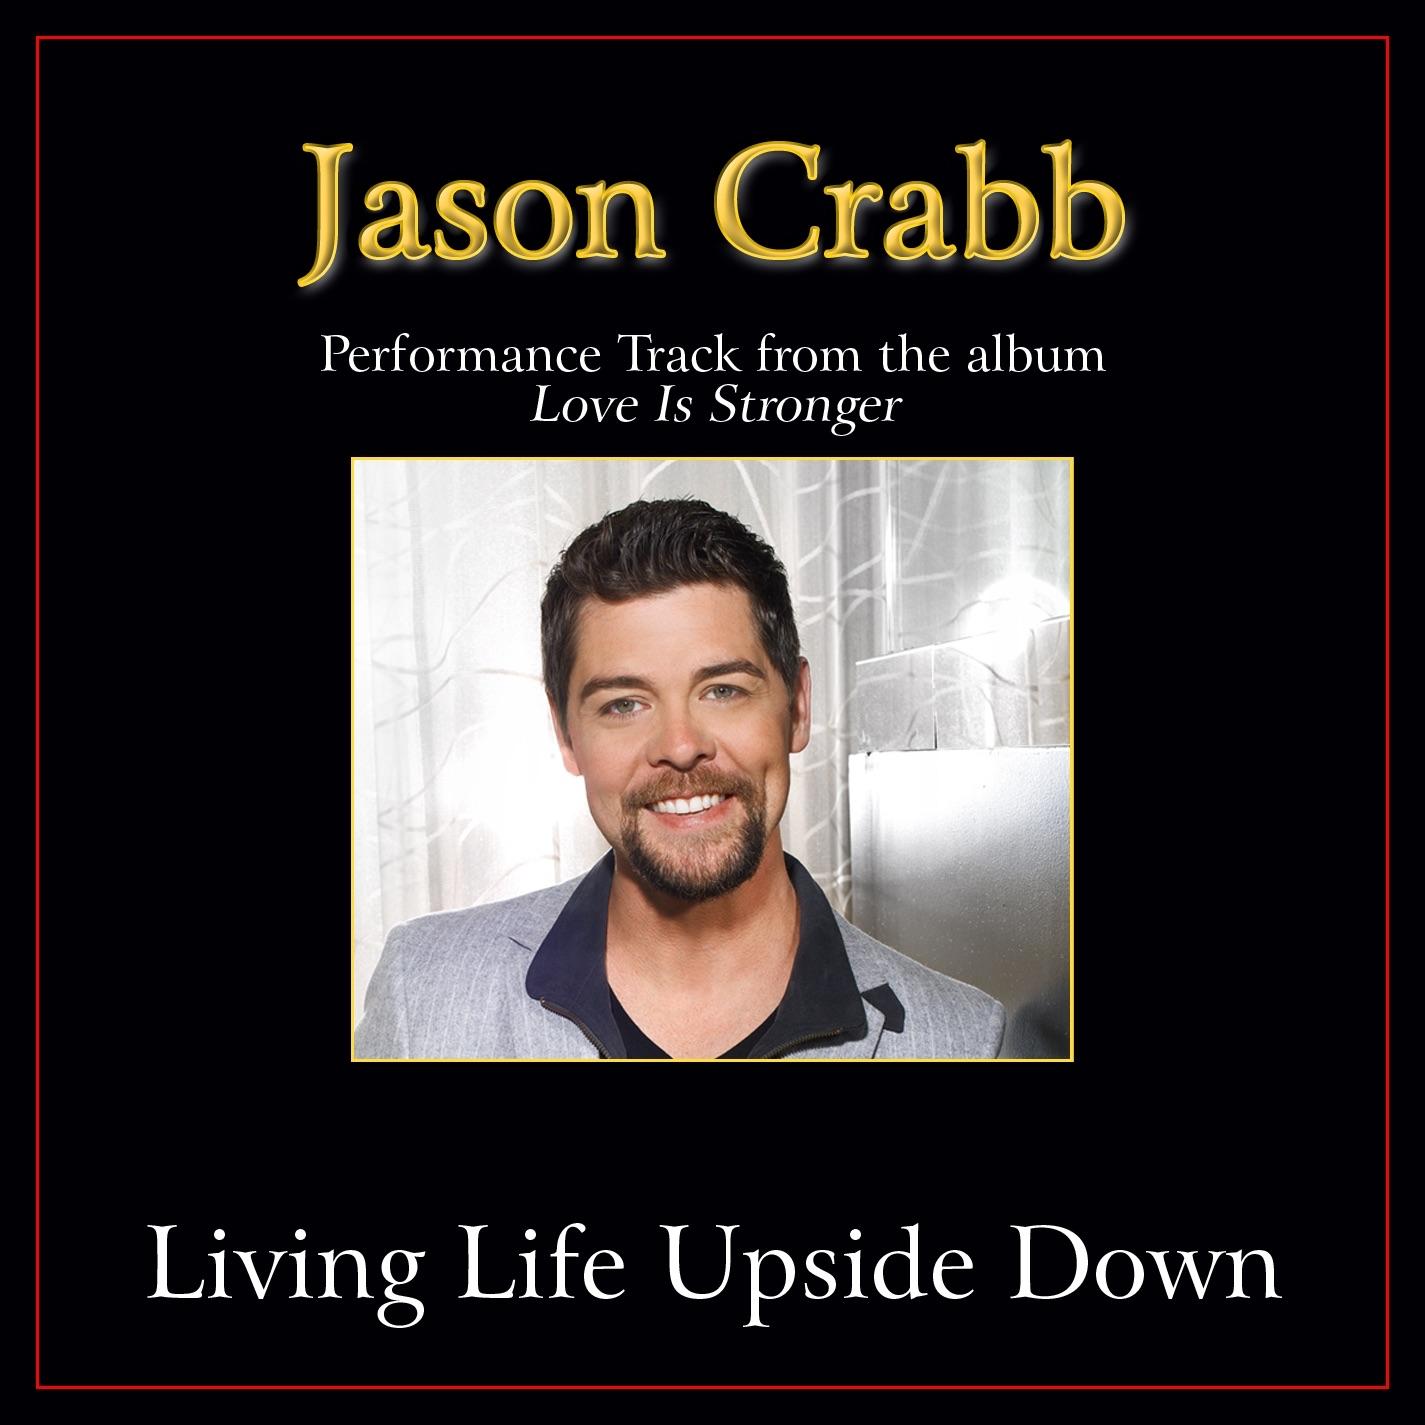 Living Life Upside Down Performance Tracks - Single